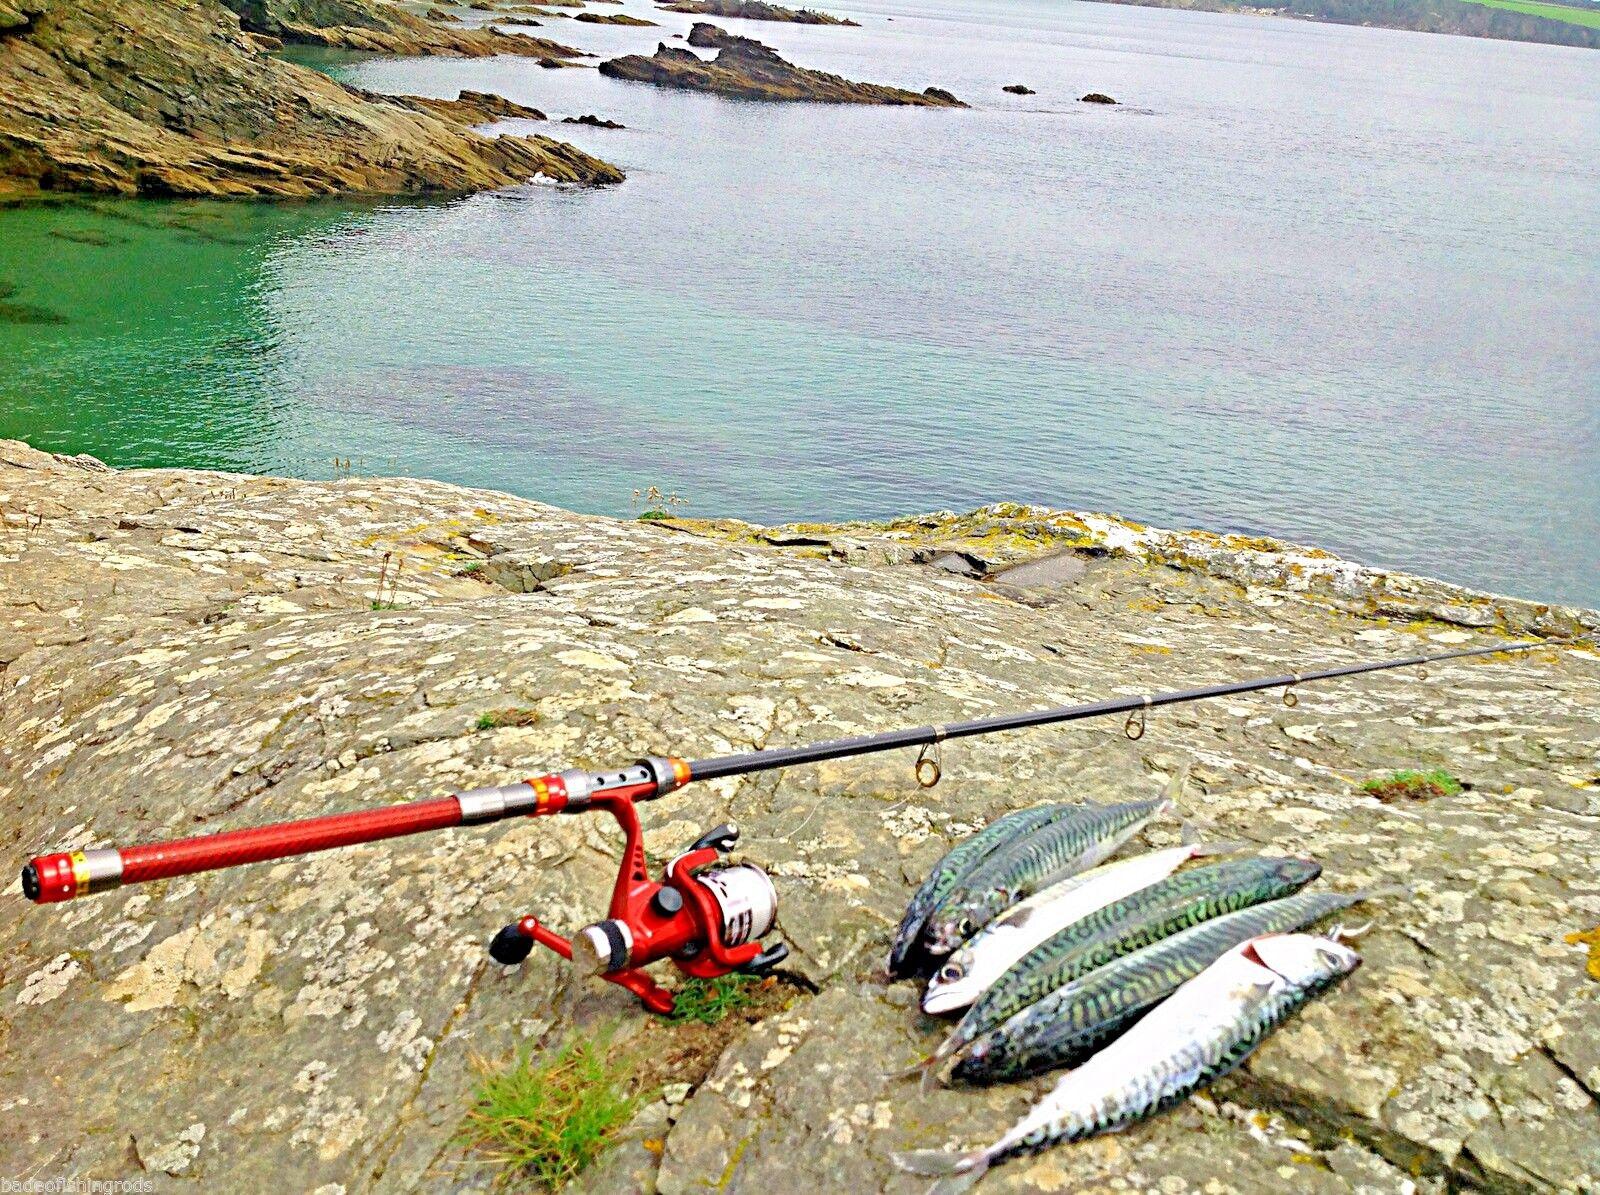 Telescopic  Fishing Rod 2.1 m   FREE REEL   FREE POSTAGE   LURE   SPINNING